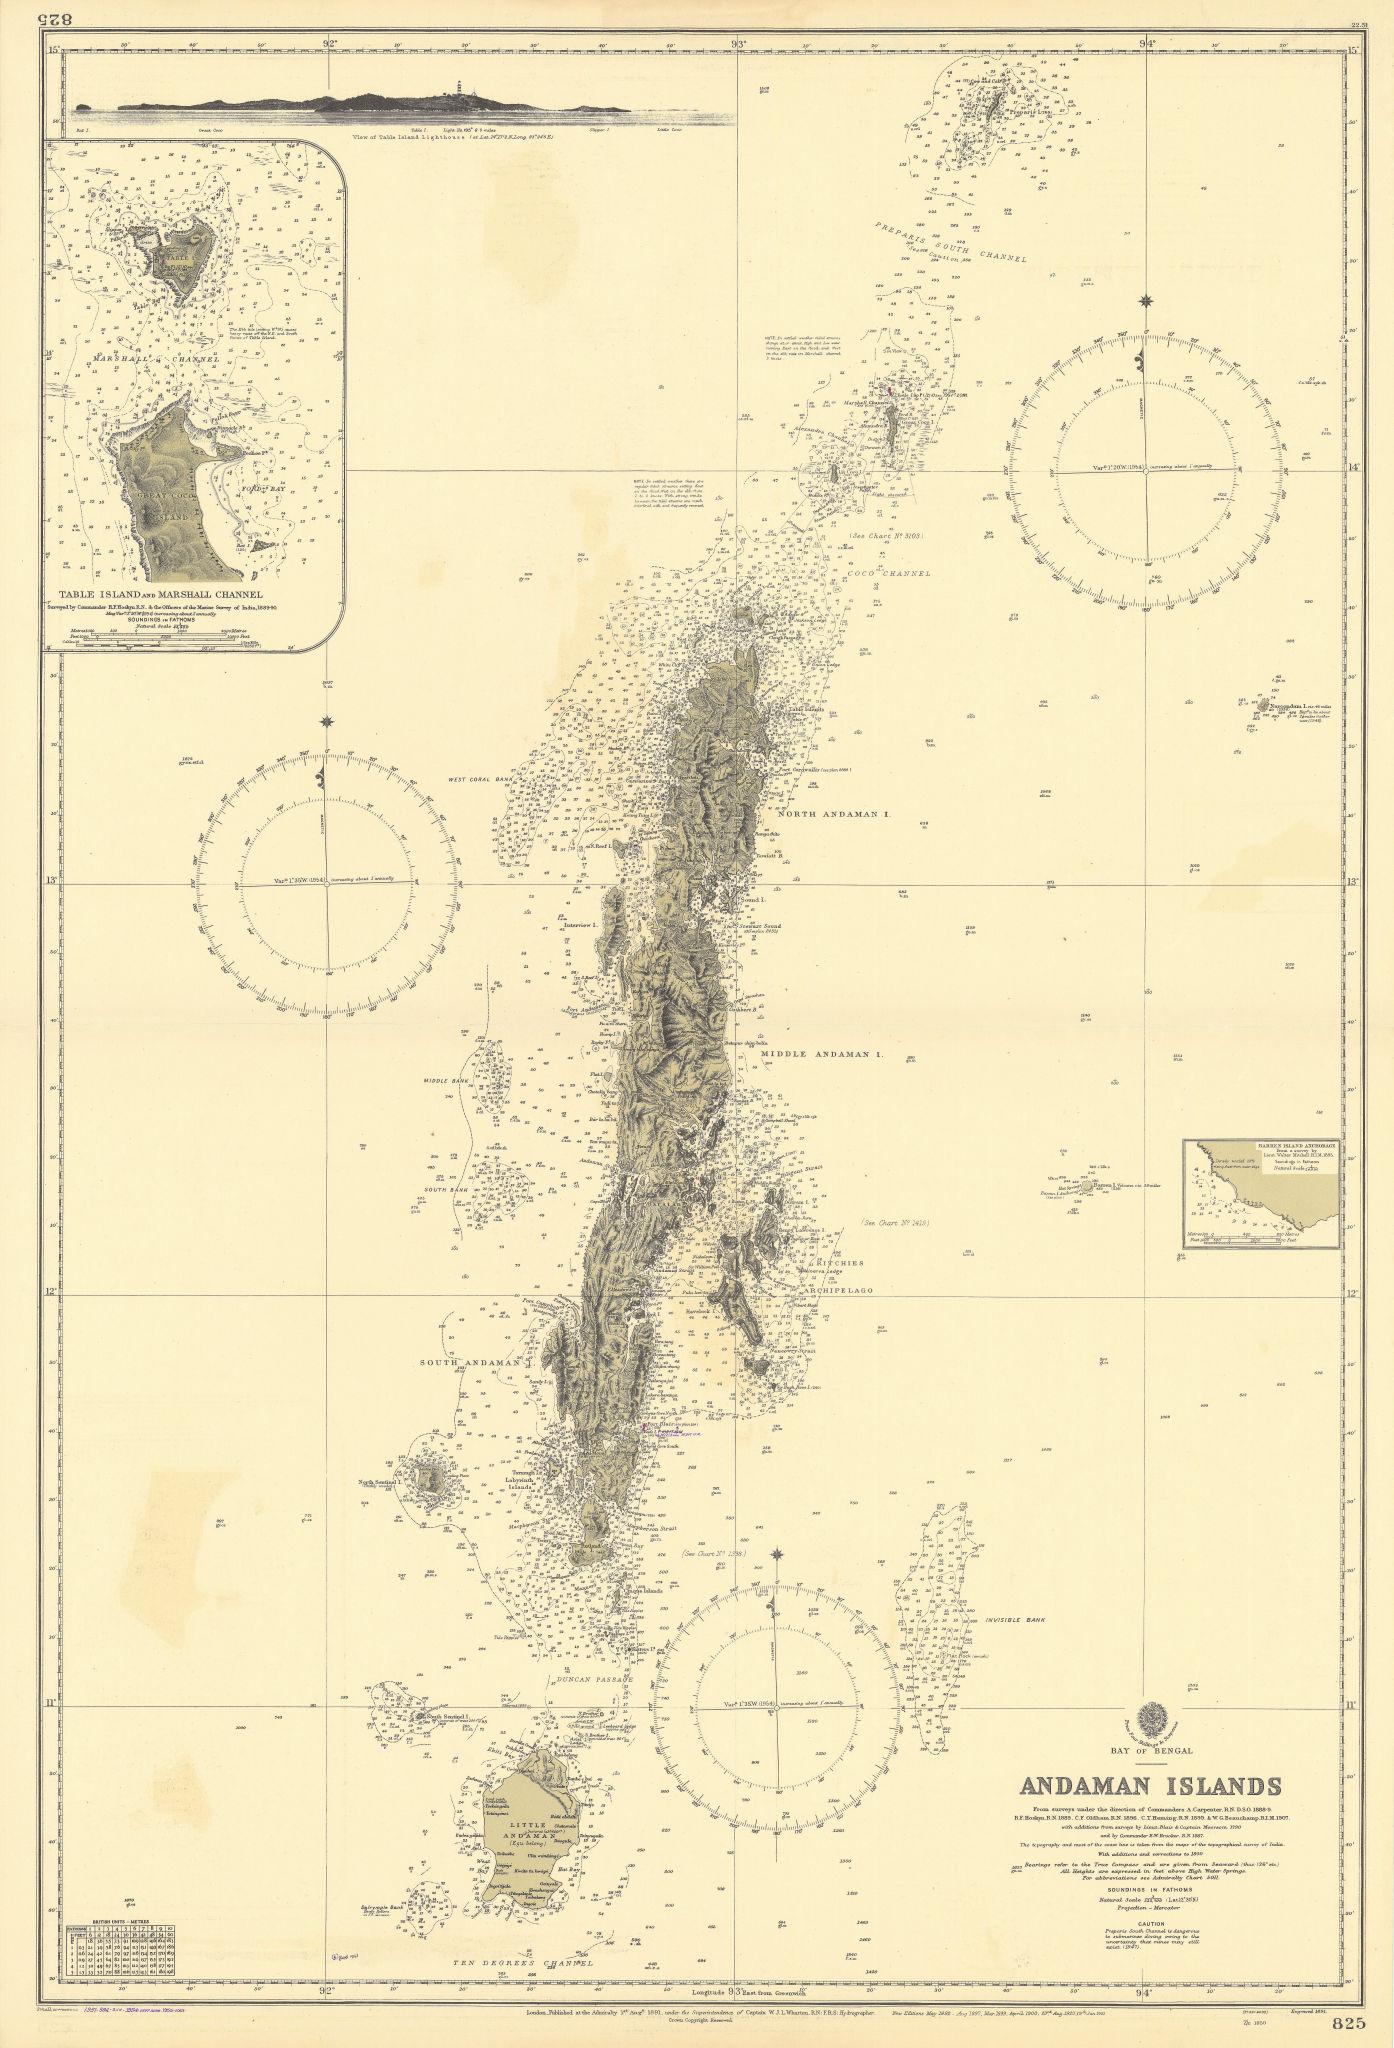 Andaman Islands. Bay of Bengal India. ADMIRALTY sea chart 1891 (1955) old map